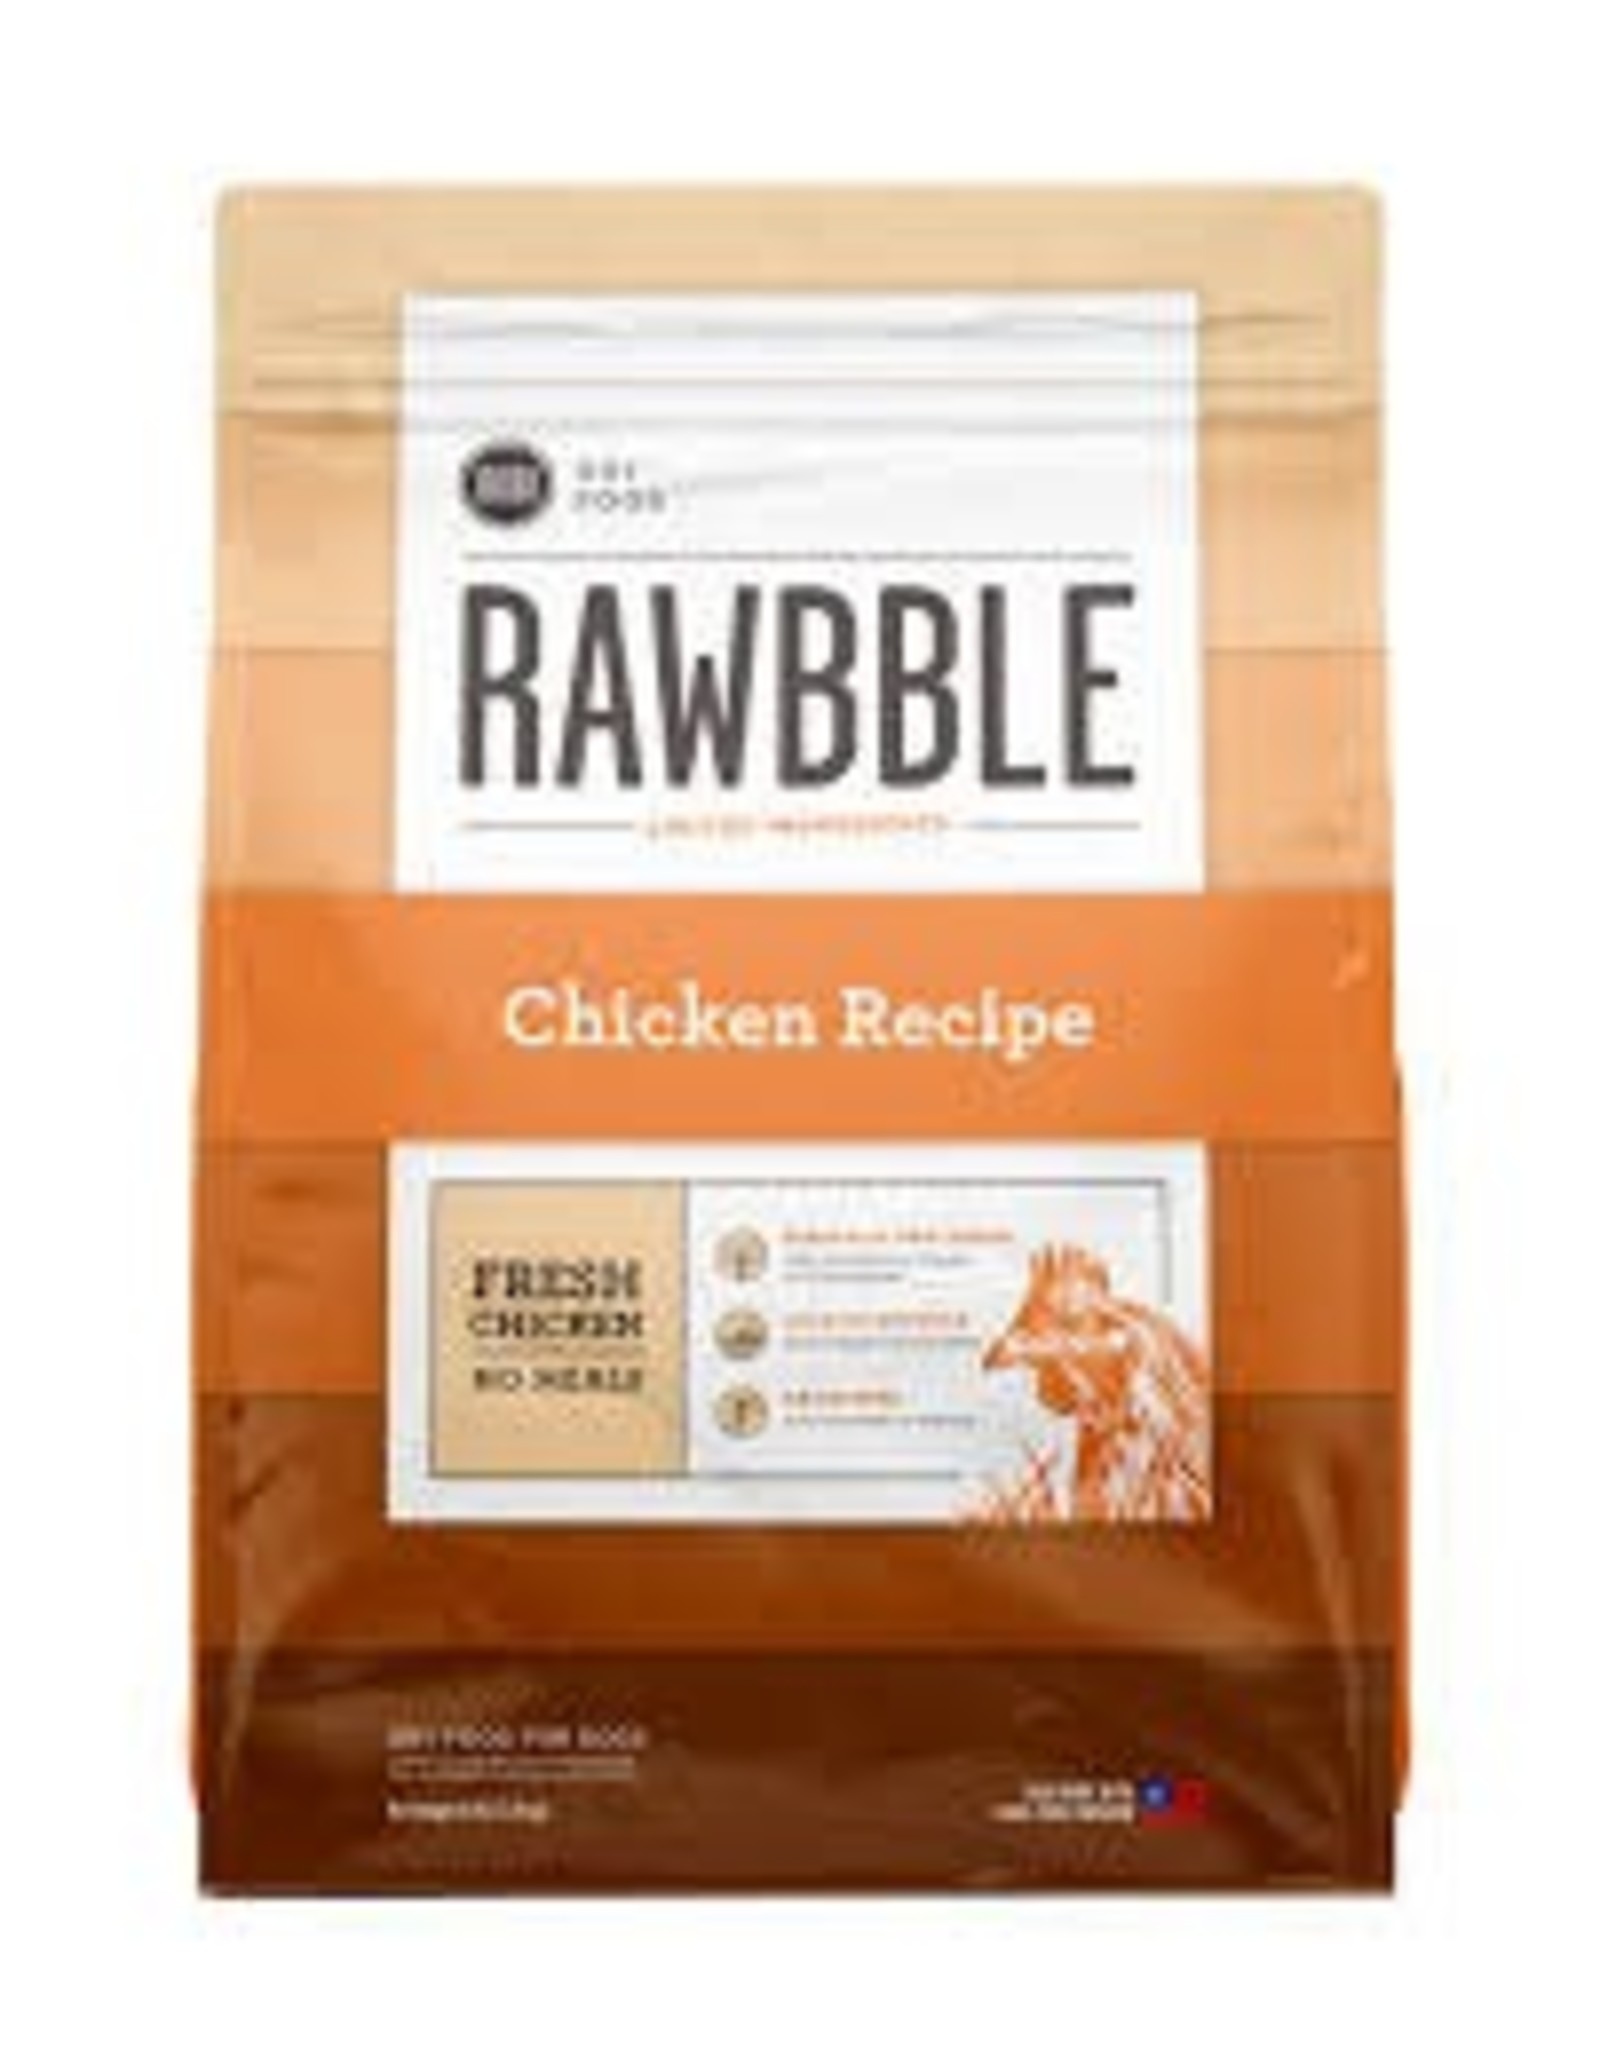 BIXBI & RAWBBLE RAWBBLE CHICKEN RECIPE 4#